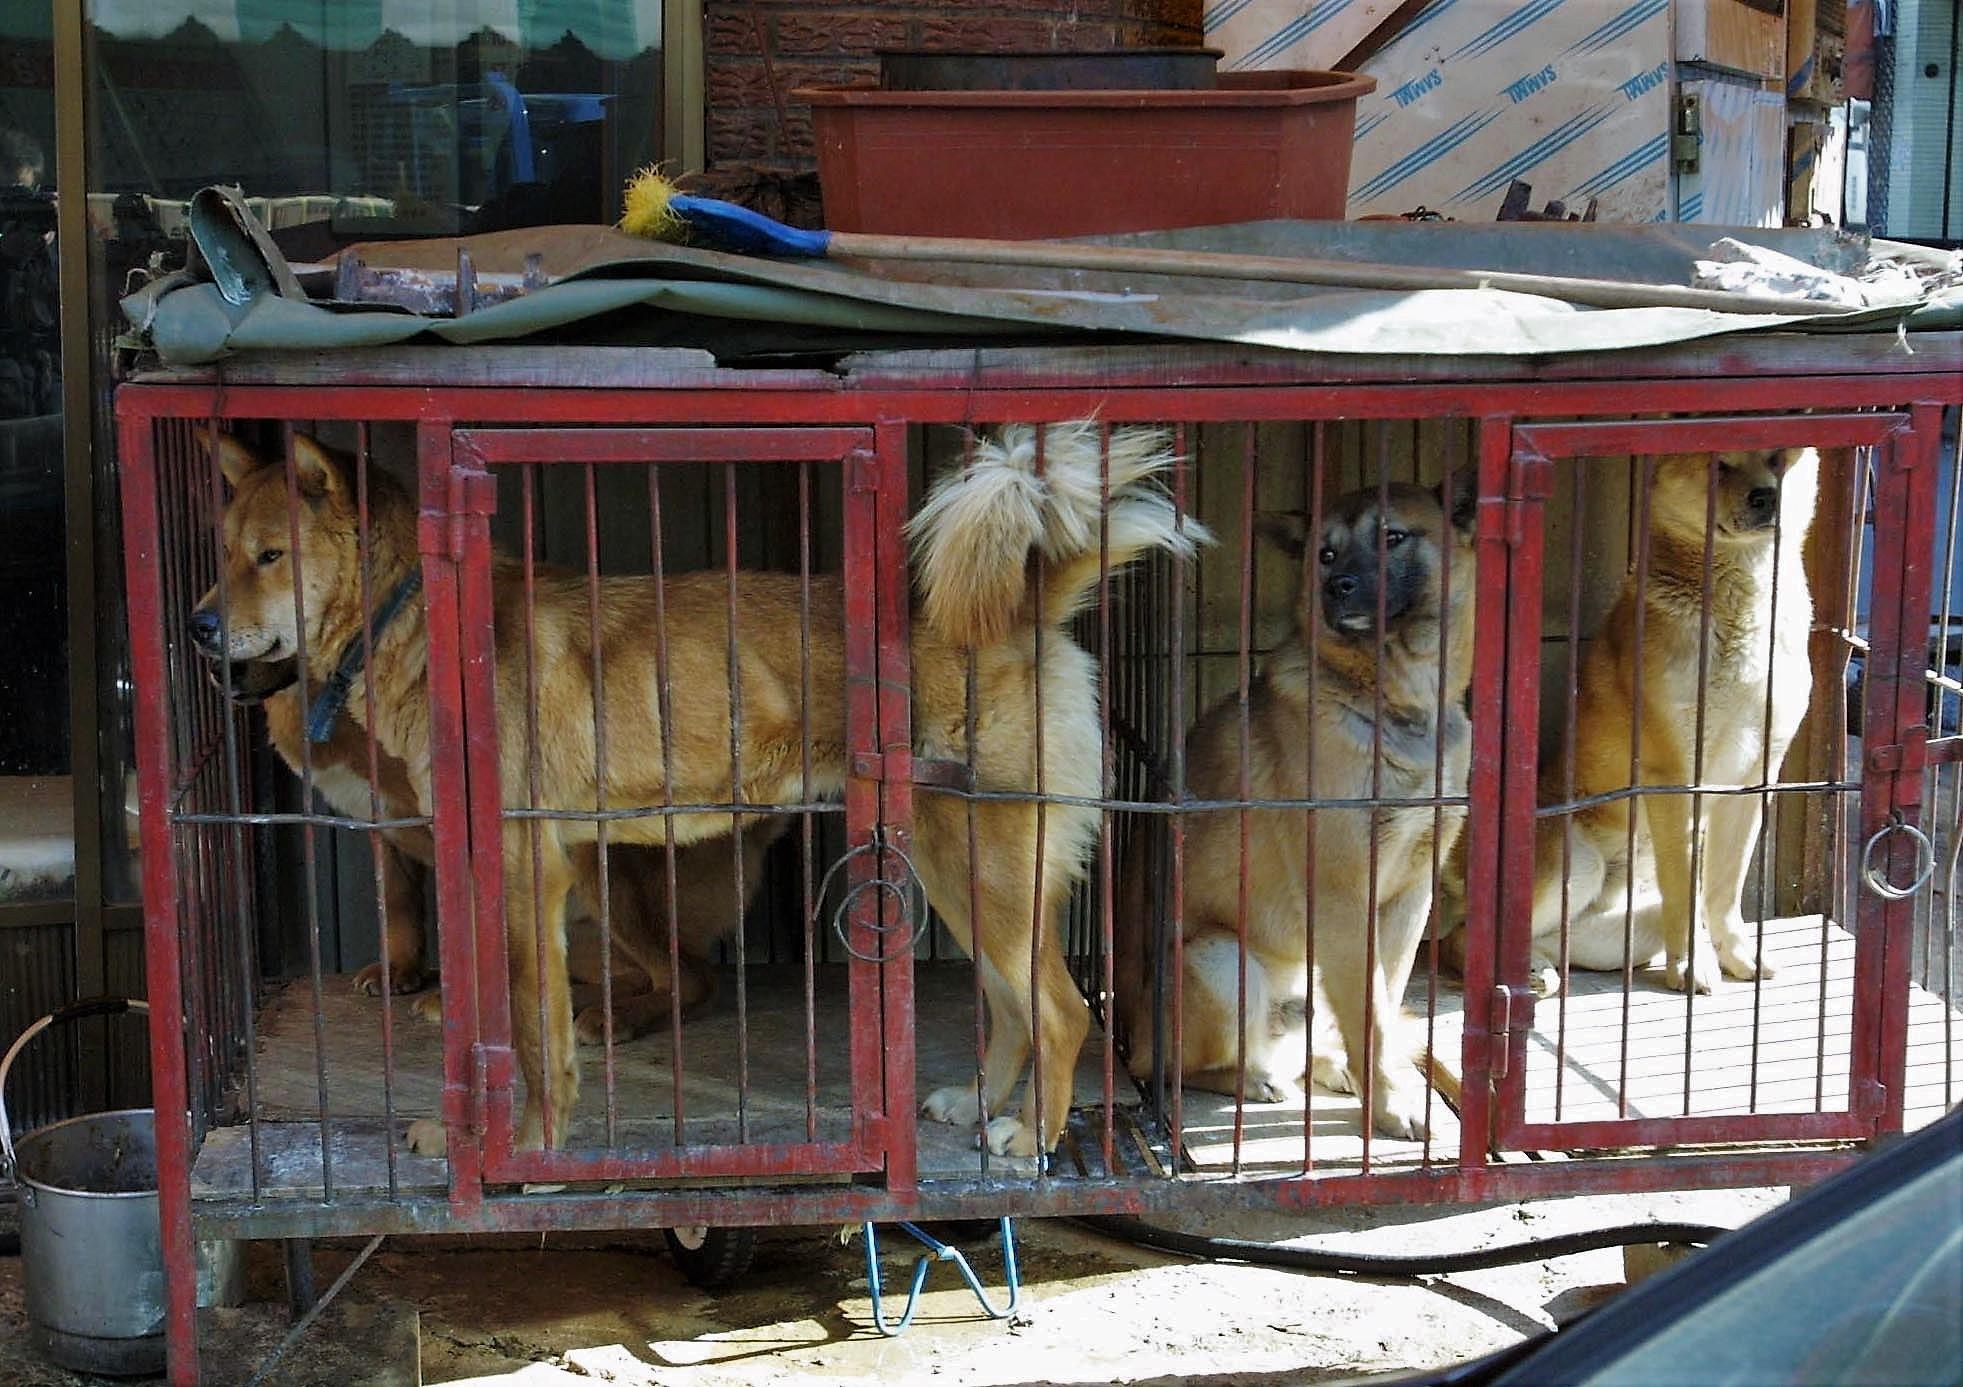 http://koreandogs.org/sister-city-campaign-daegu-south-korea-milwaukee-wisconsin/?utm_source=sendinblue&utm_campaign=Dogs_Slaughterhouses_in_School_Cleanup_Zone!___Milwaukee__Daegu_Sister_City&utm_medium=email